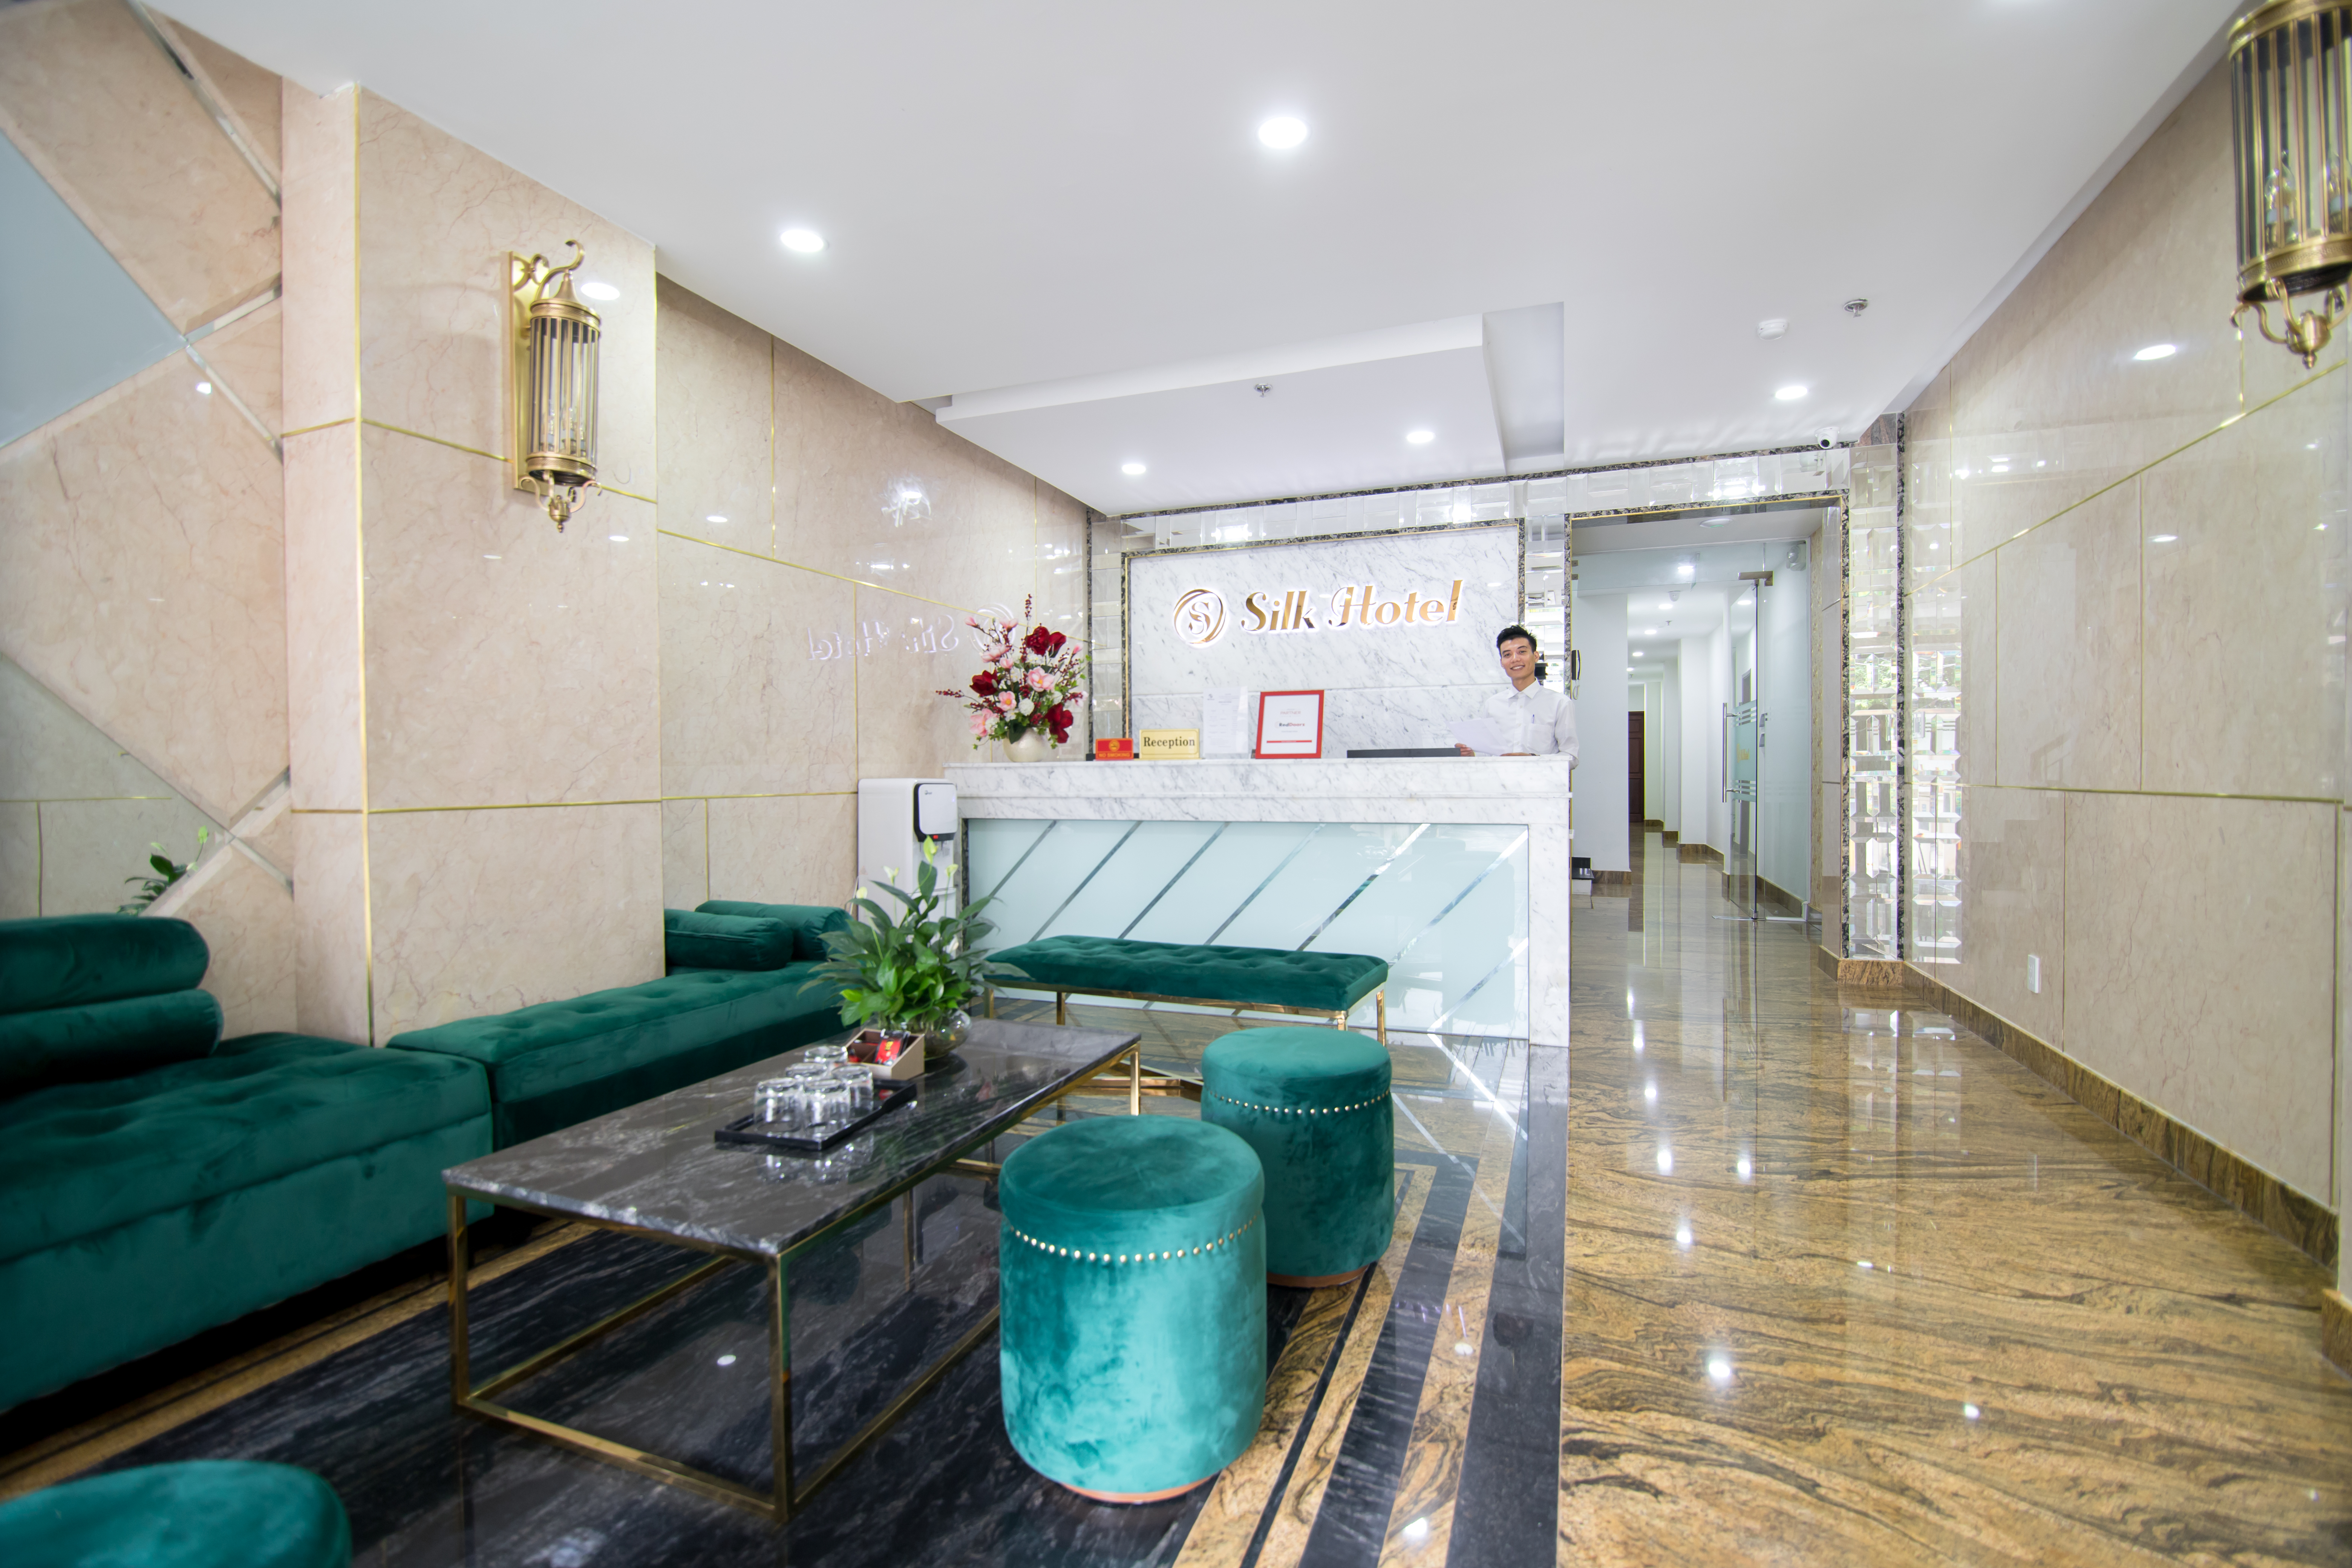 Silk Hotel, Phú Nhuận